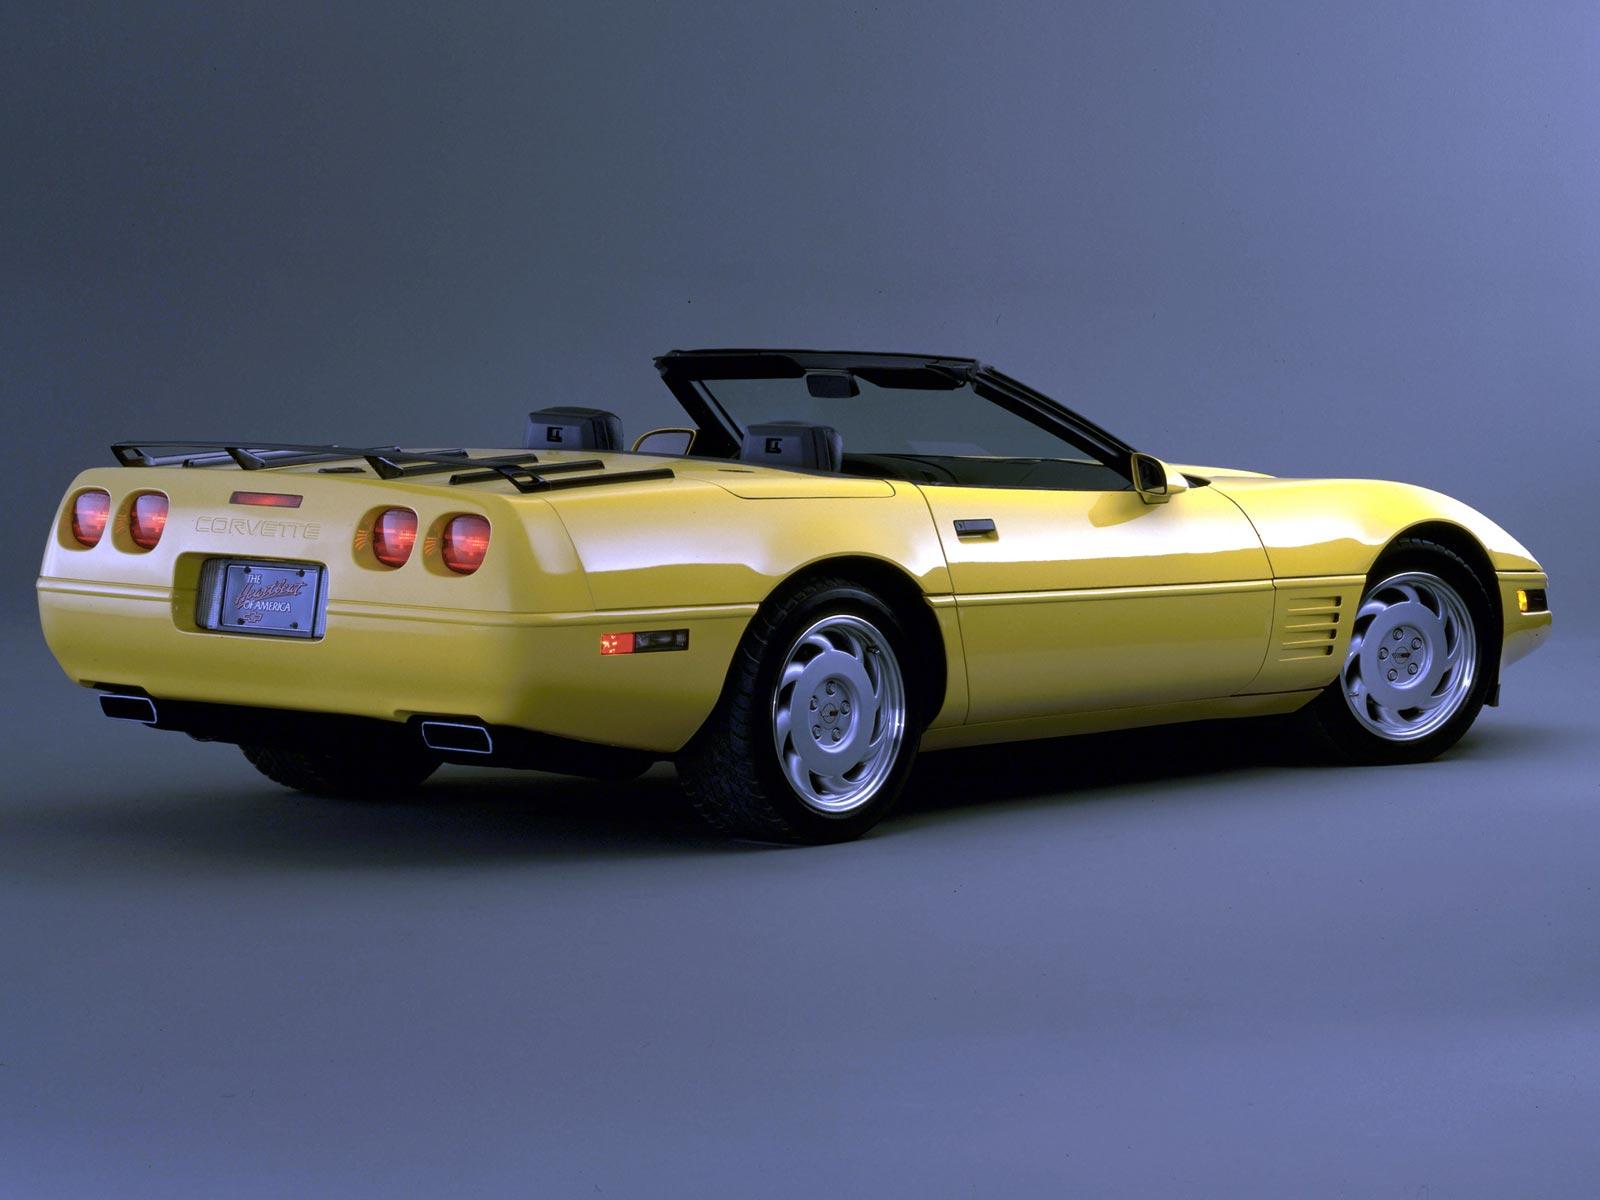 1992 Chevrolet Corvette Cabrio (c) Chevrolet